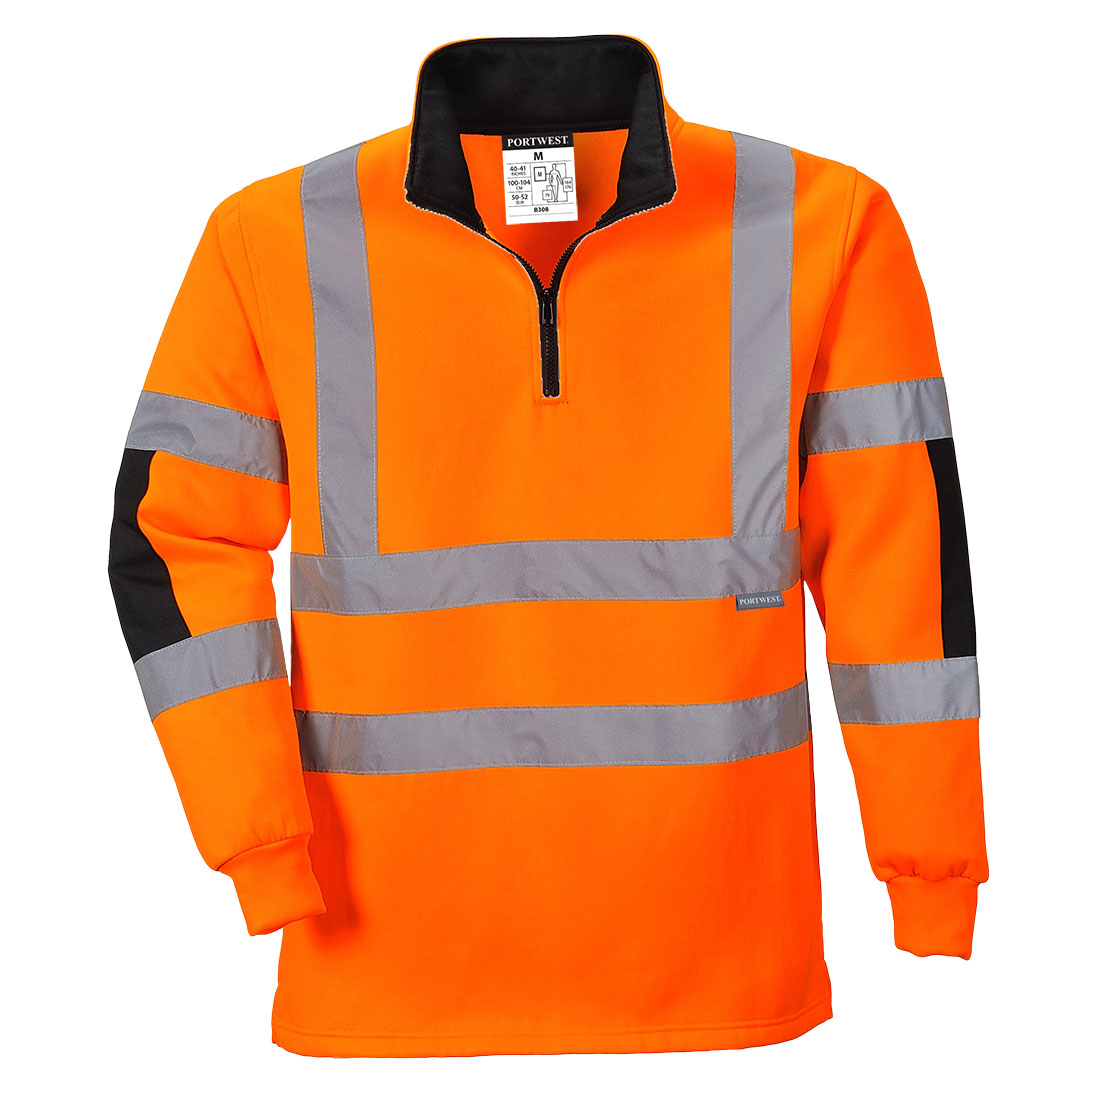 Xenon Rugby Shirt Orange Large